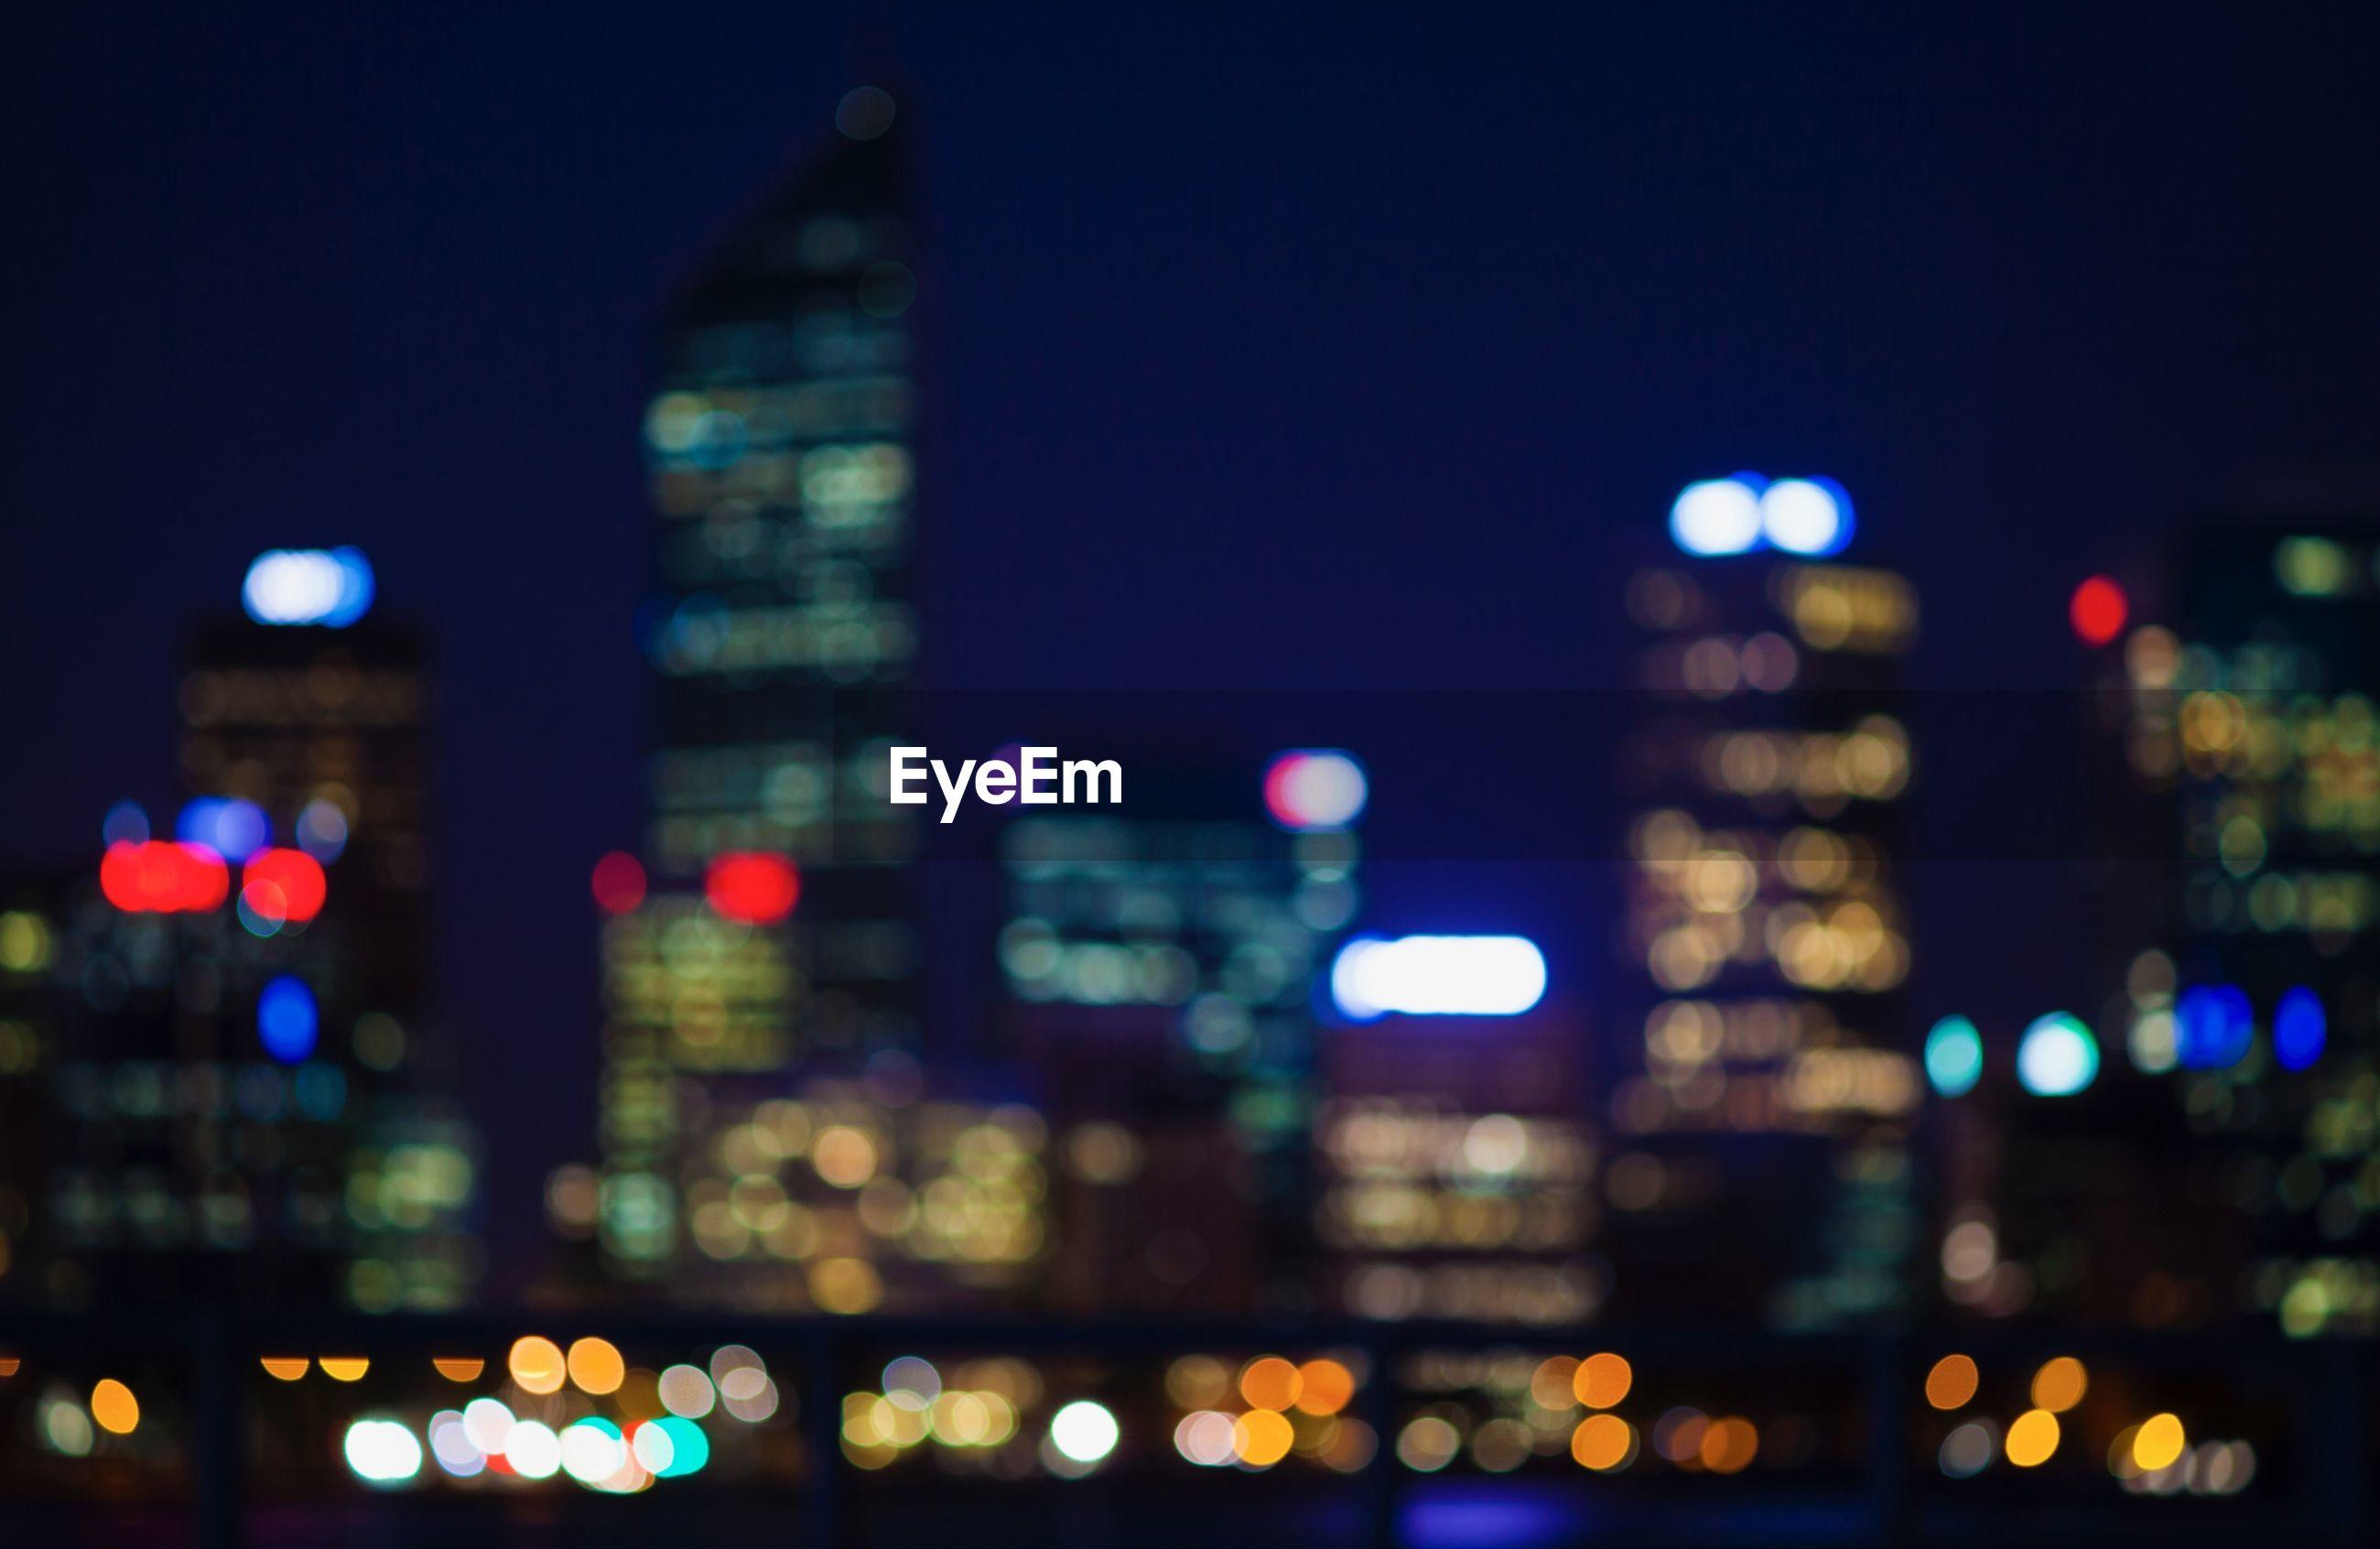 DEFOCUSED IMAGE OF ILLUMINATED CITY BUILDINGS AT NIGHT